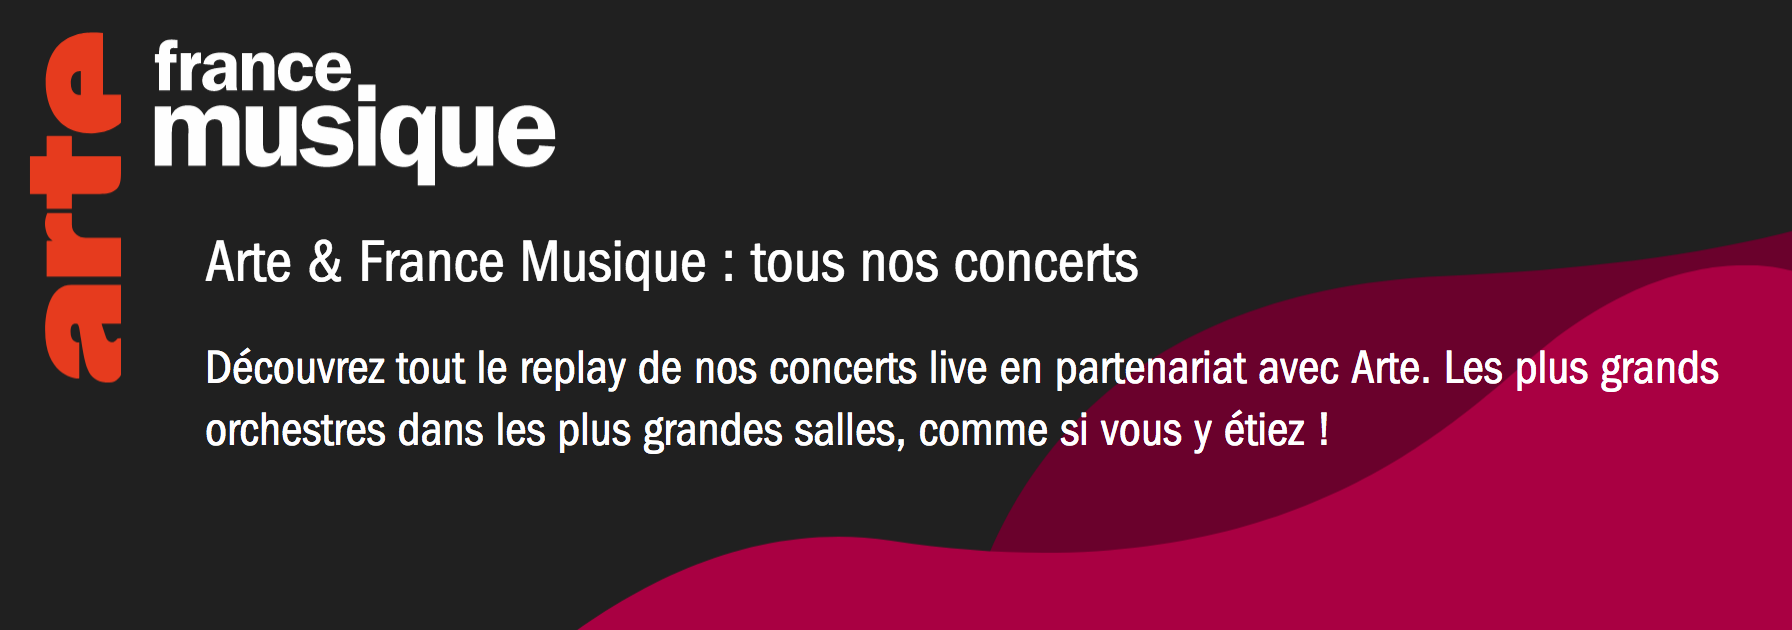 France Musique inaugure sa salle de concert virtuelle